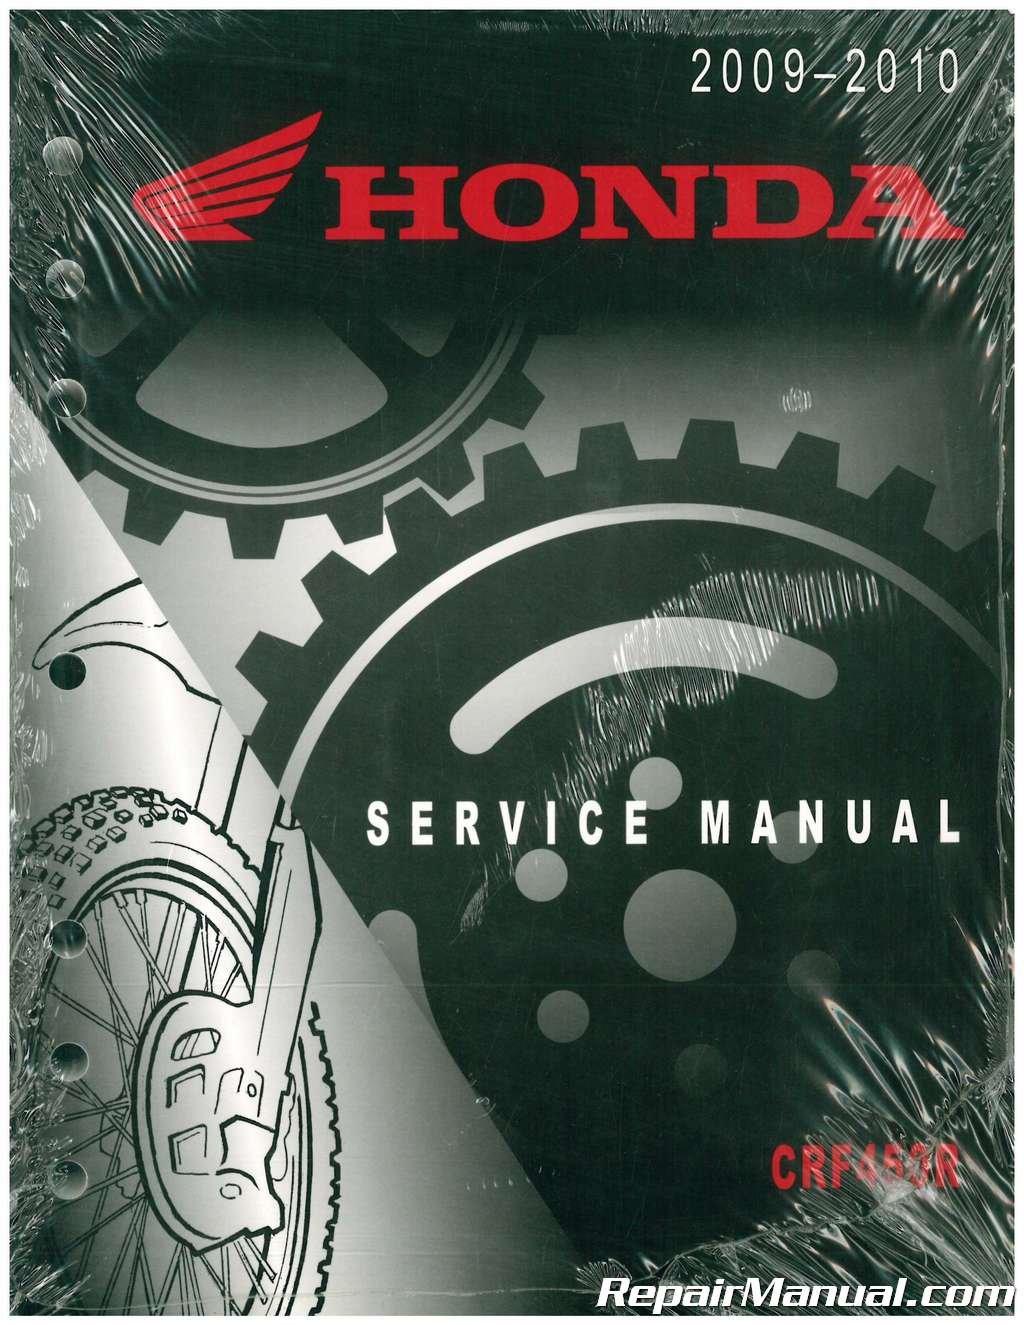 61MEN71 2009-2010 Honda CRF450R Motorcycle Service Manual: Manufacturer:  Amazon.com: Books